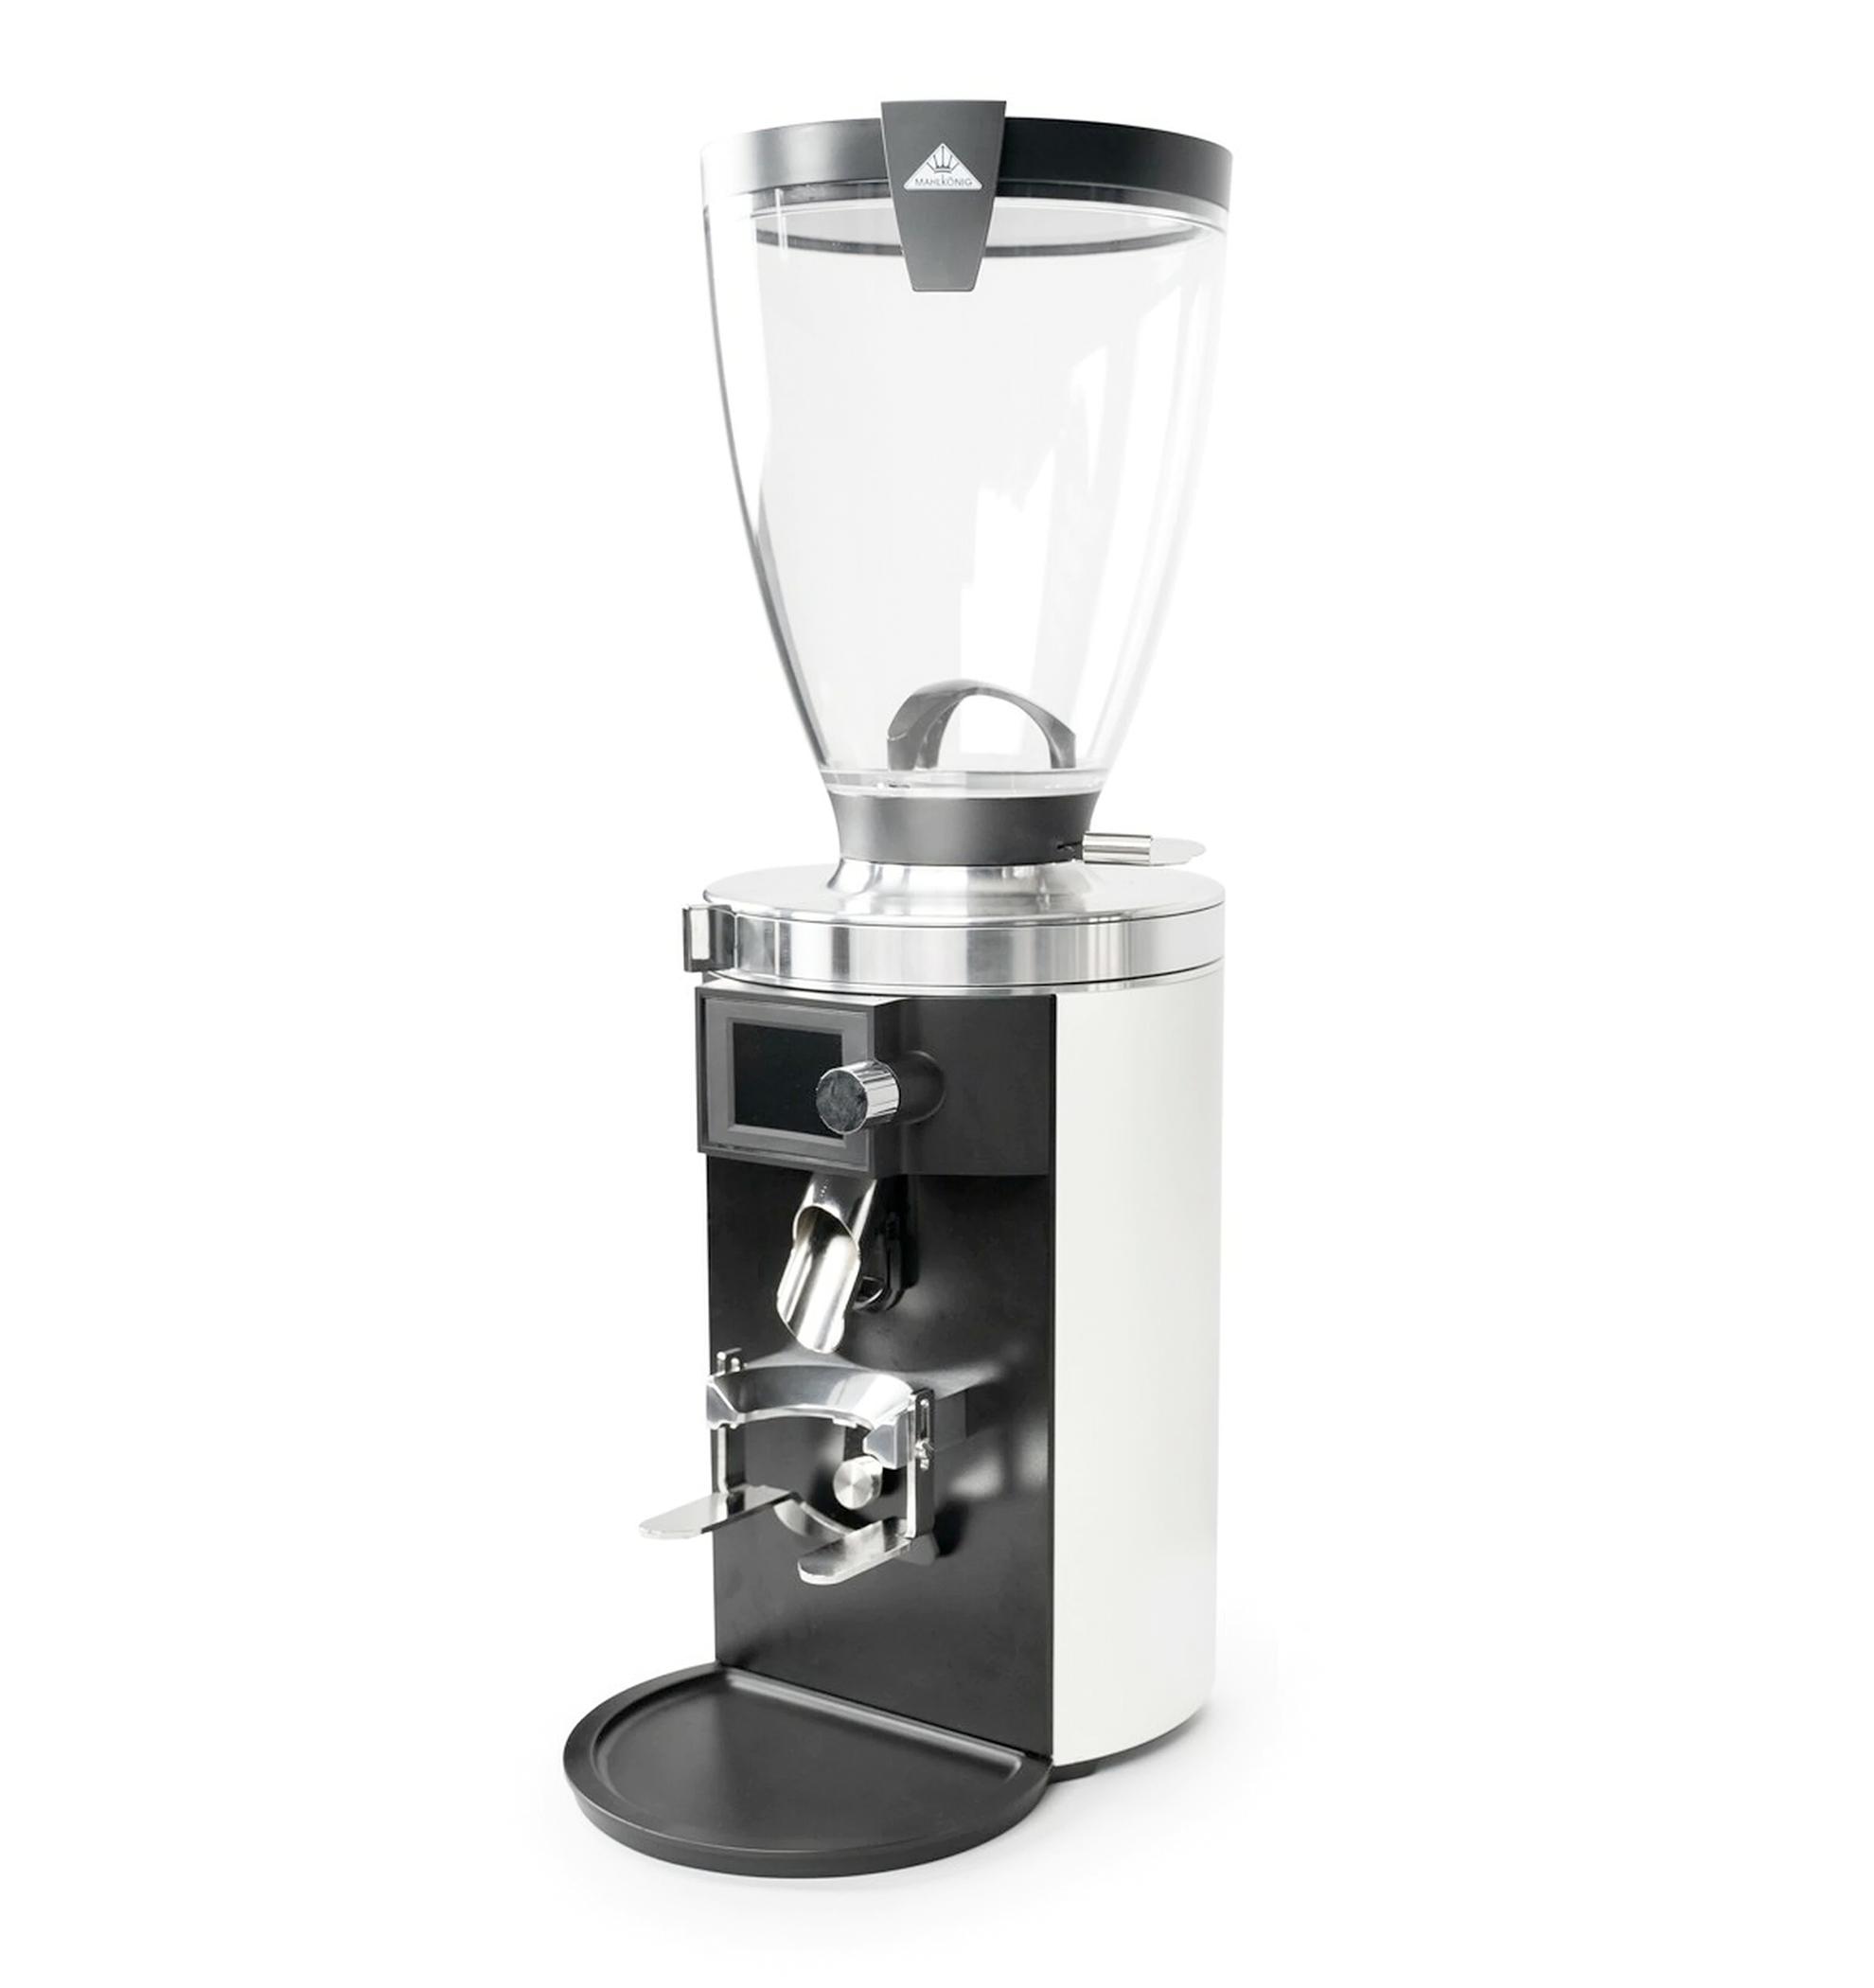 Mahlkönig E65S Espressomühle - Matt Weiss